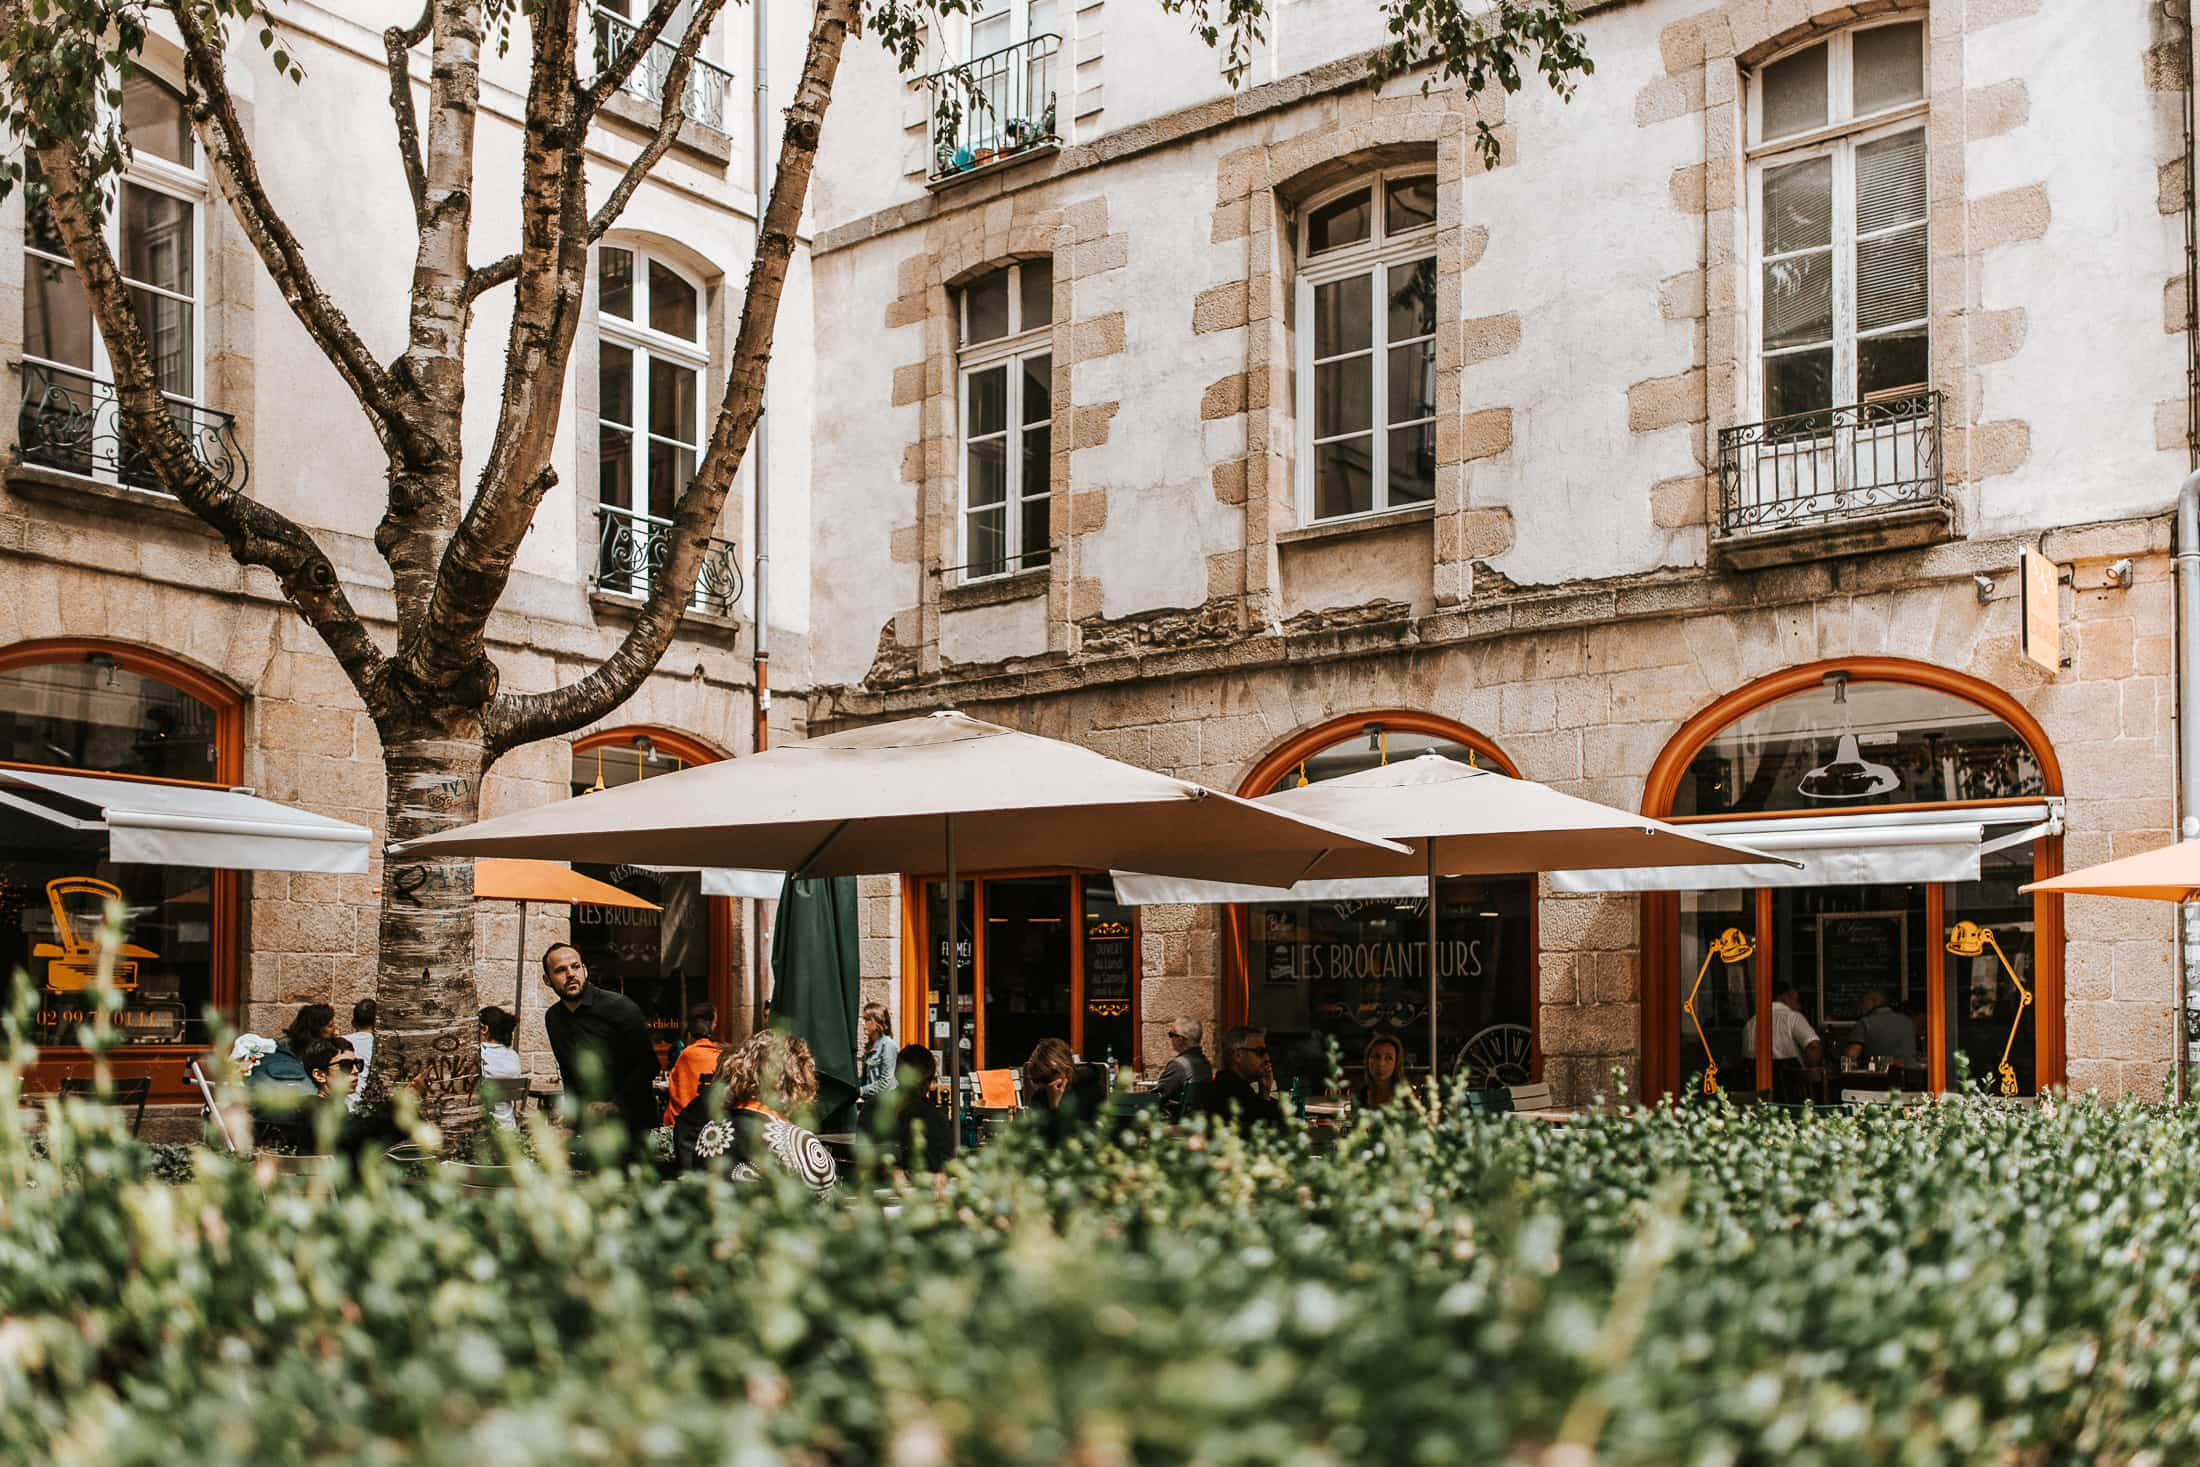 Une balade à Rennes : où manger, quoi visiter – partie 1